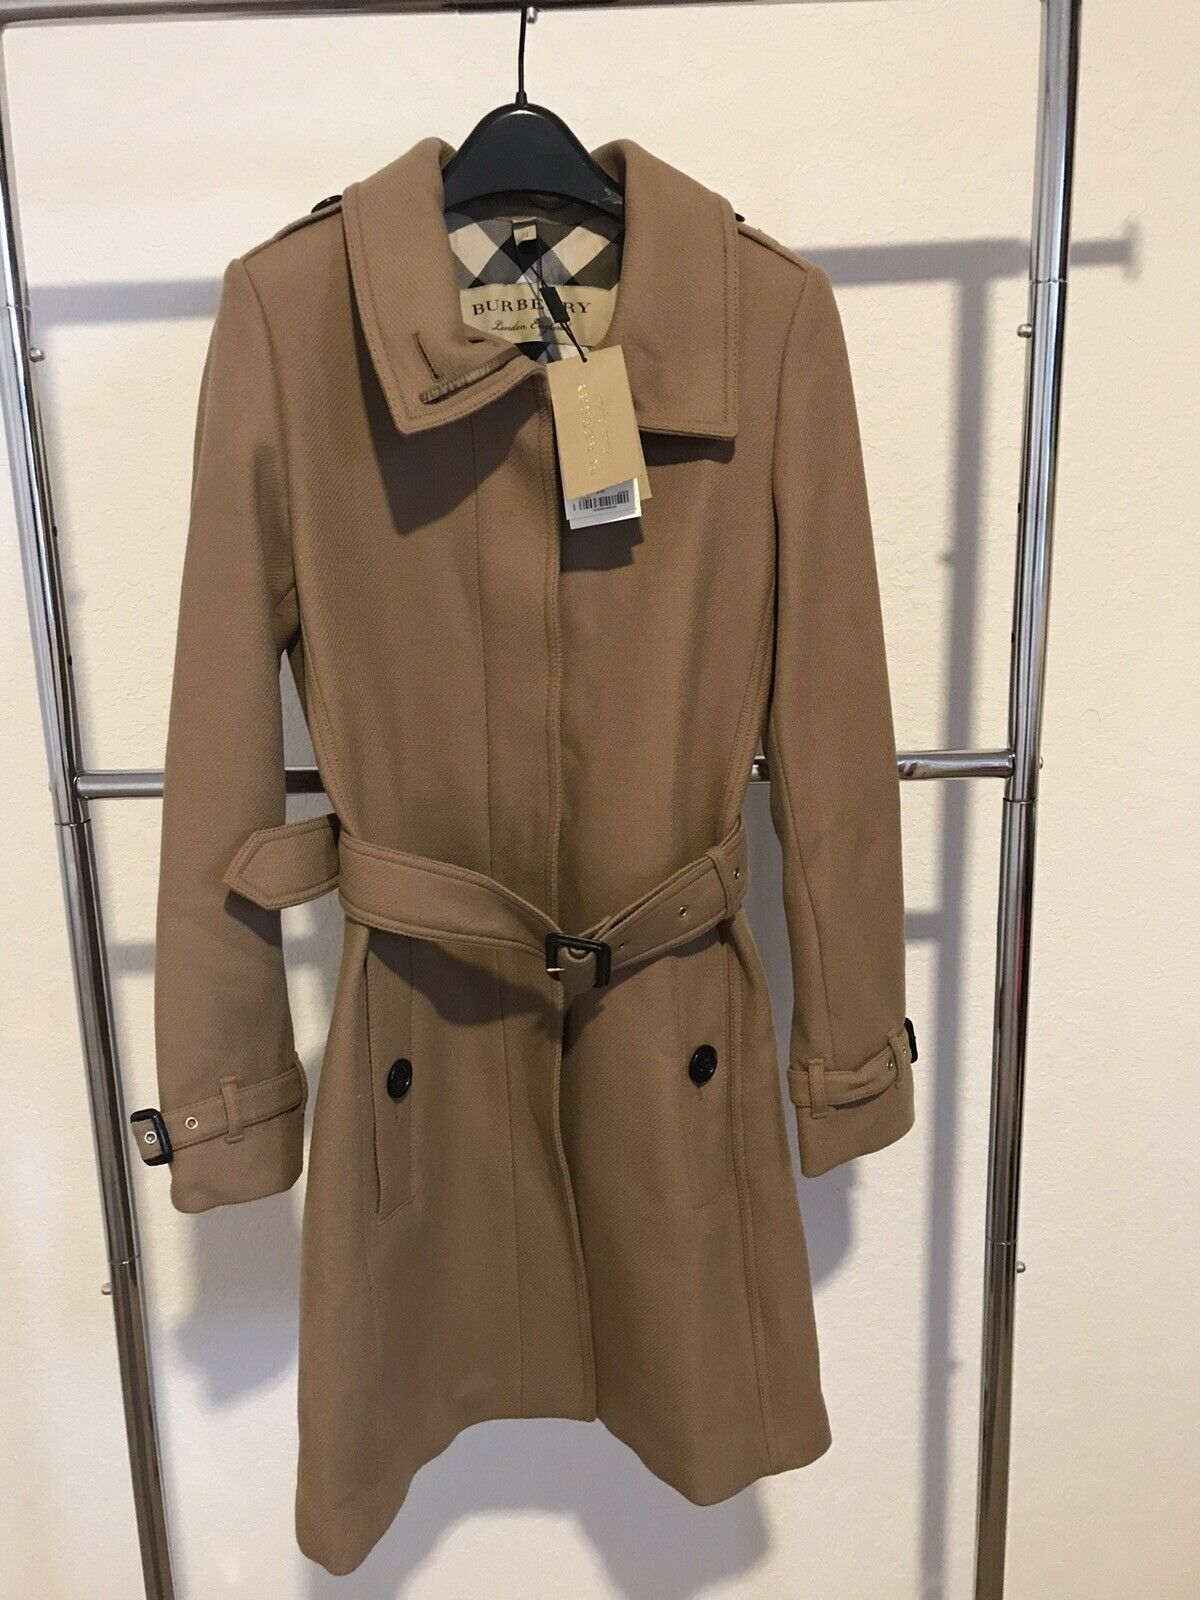 Burberry Woman's Gibbsmooresl Wool Blend Trench Coat. Camel. Sz 04 US.New w/Tags